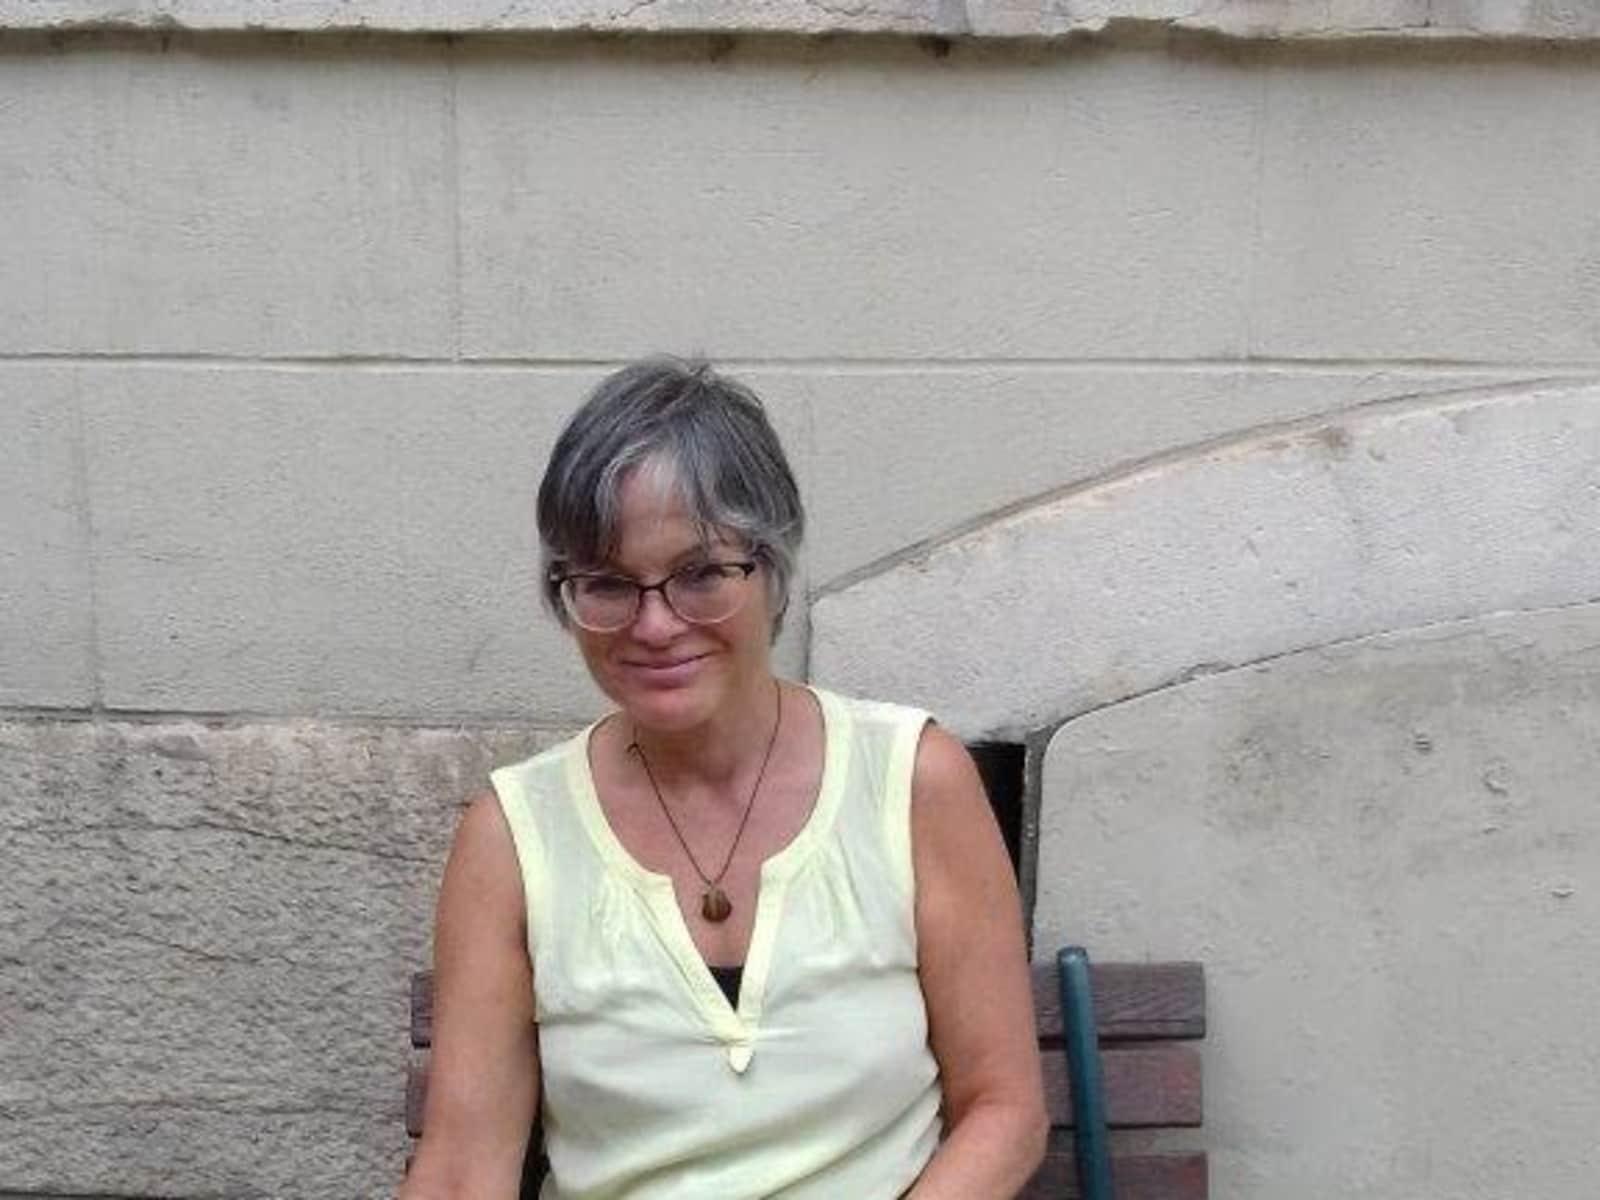 Sonja from Ingolstadt, Germany